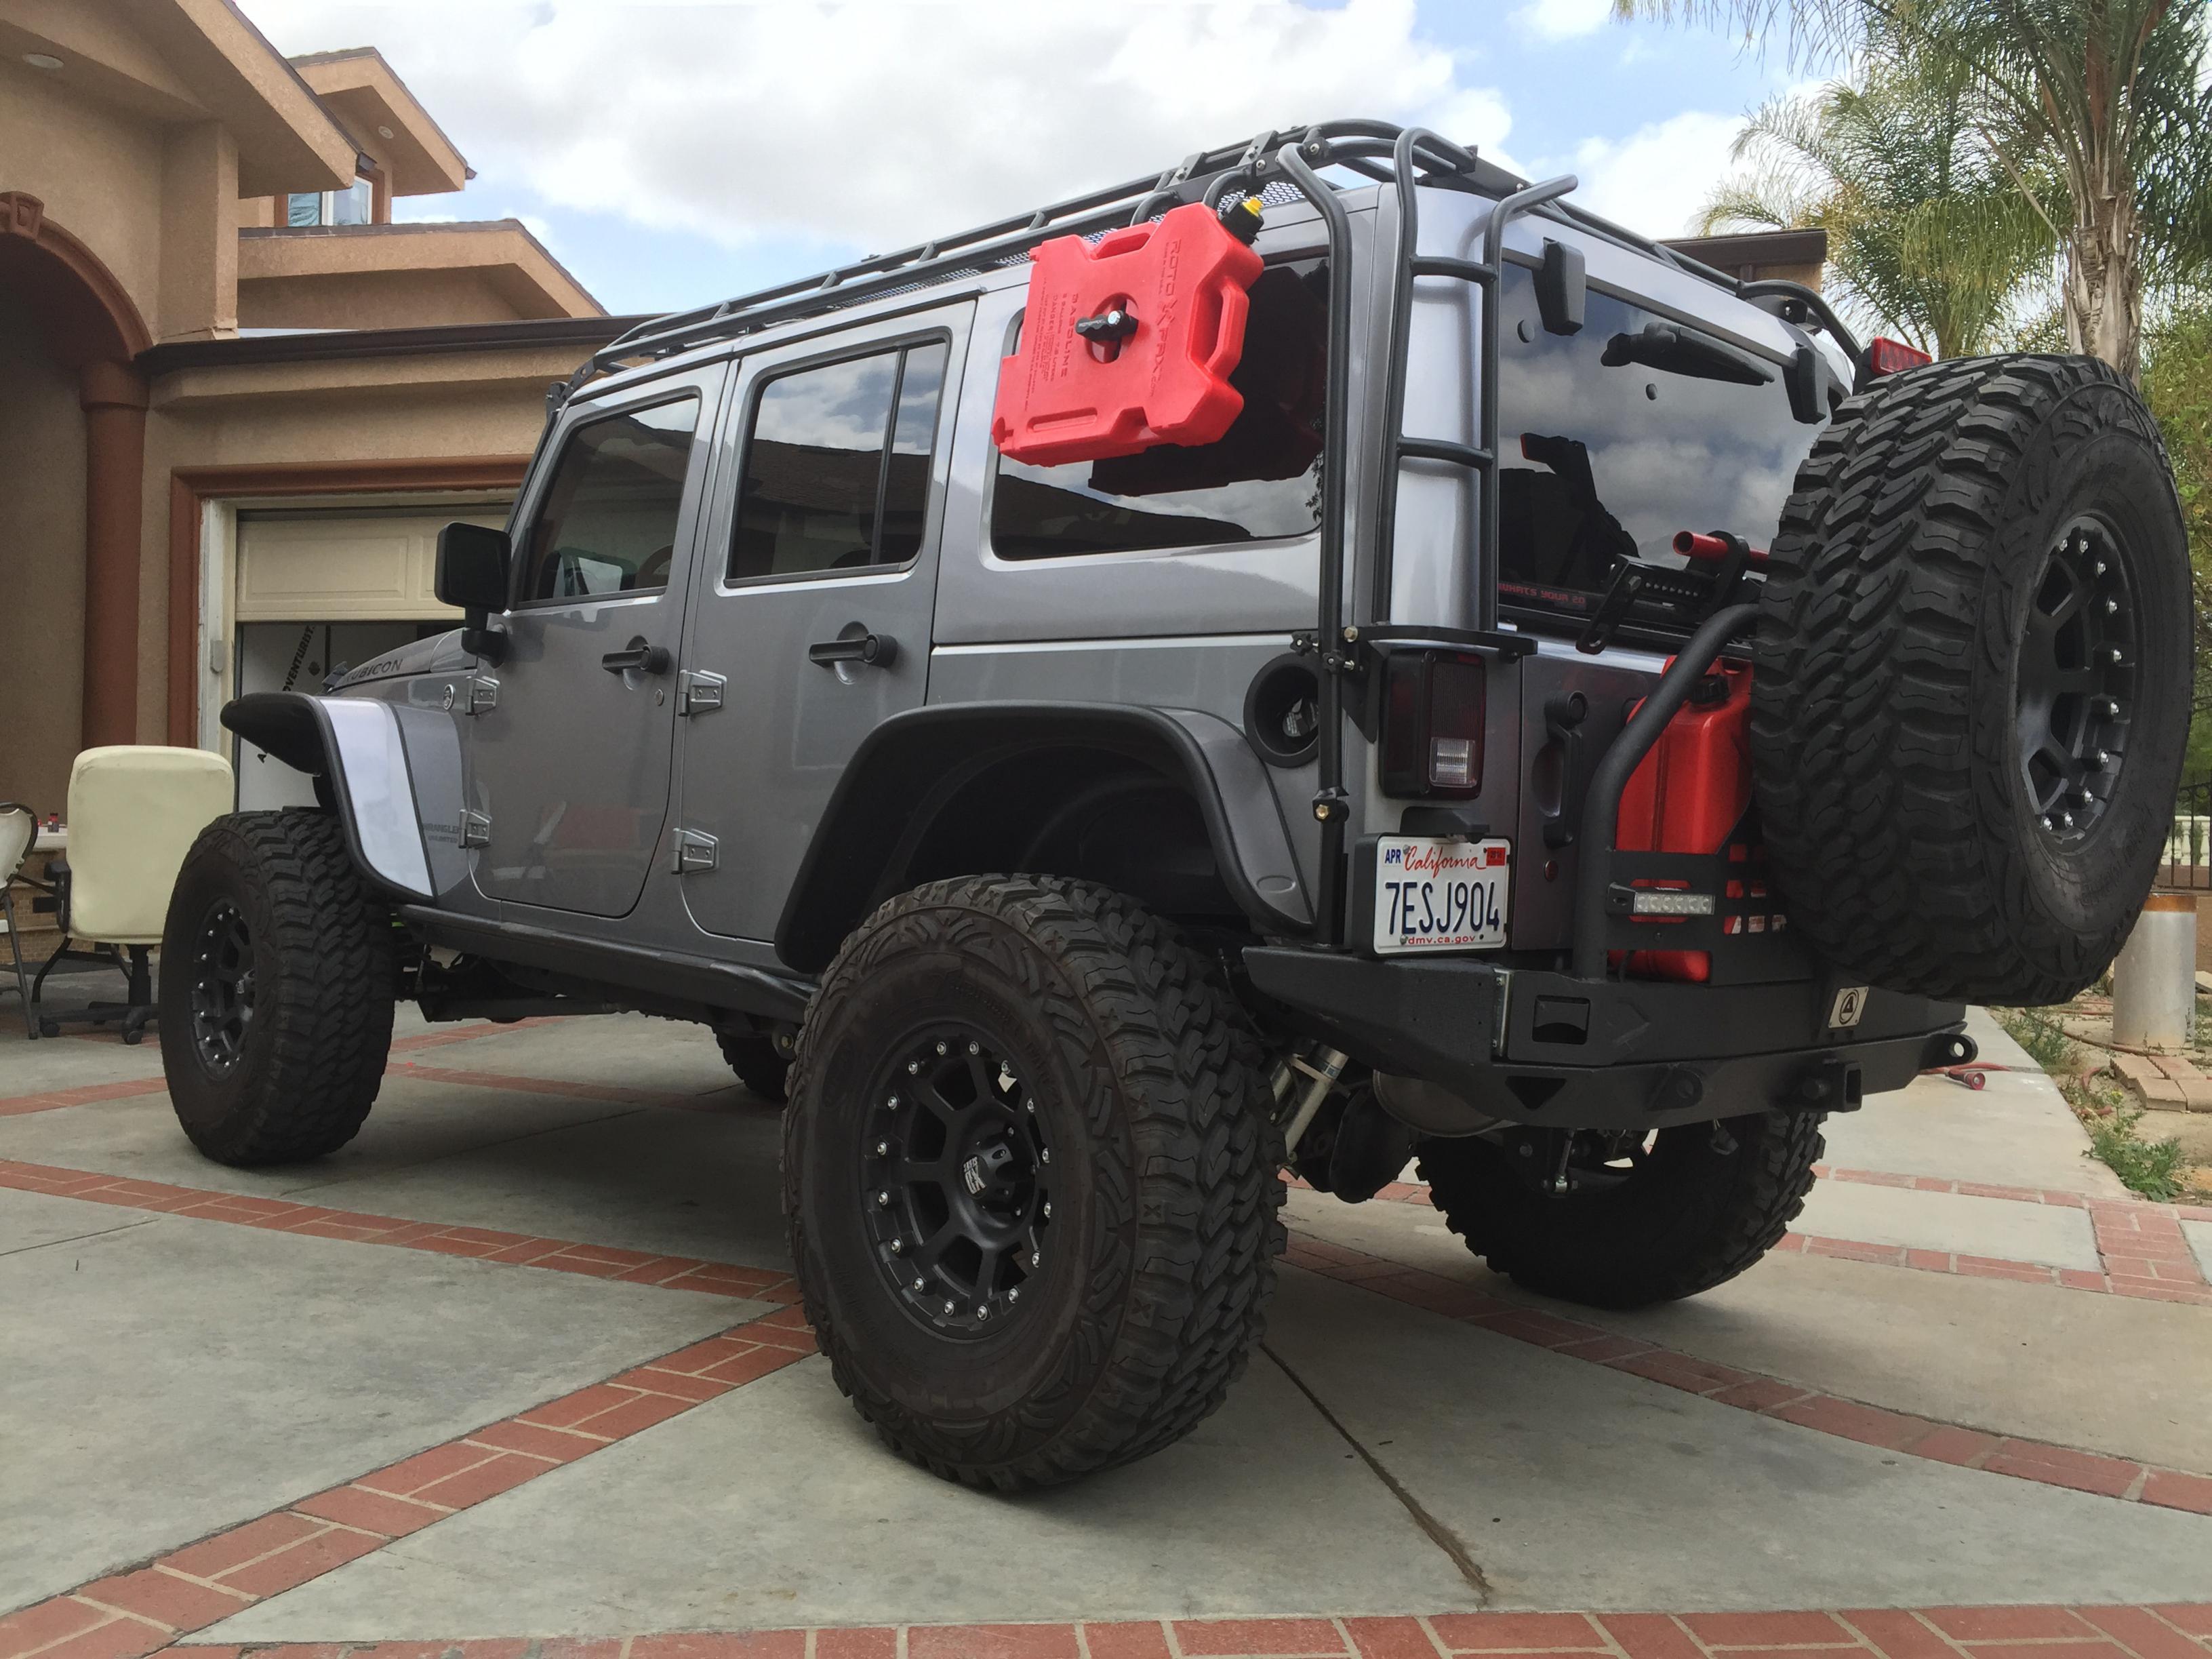 Jeep Jku Roof Rack >> Jeep JK Roof Rack - JKowners.com : Jeep Wrangler JK Forum